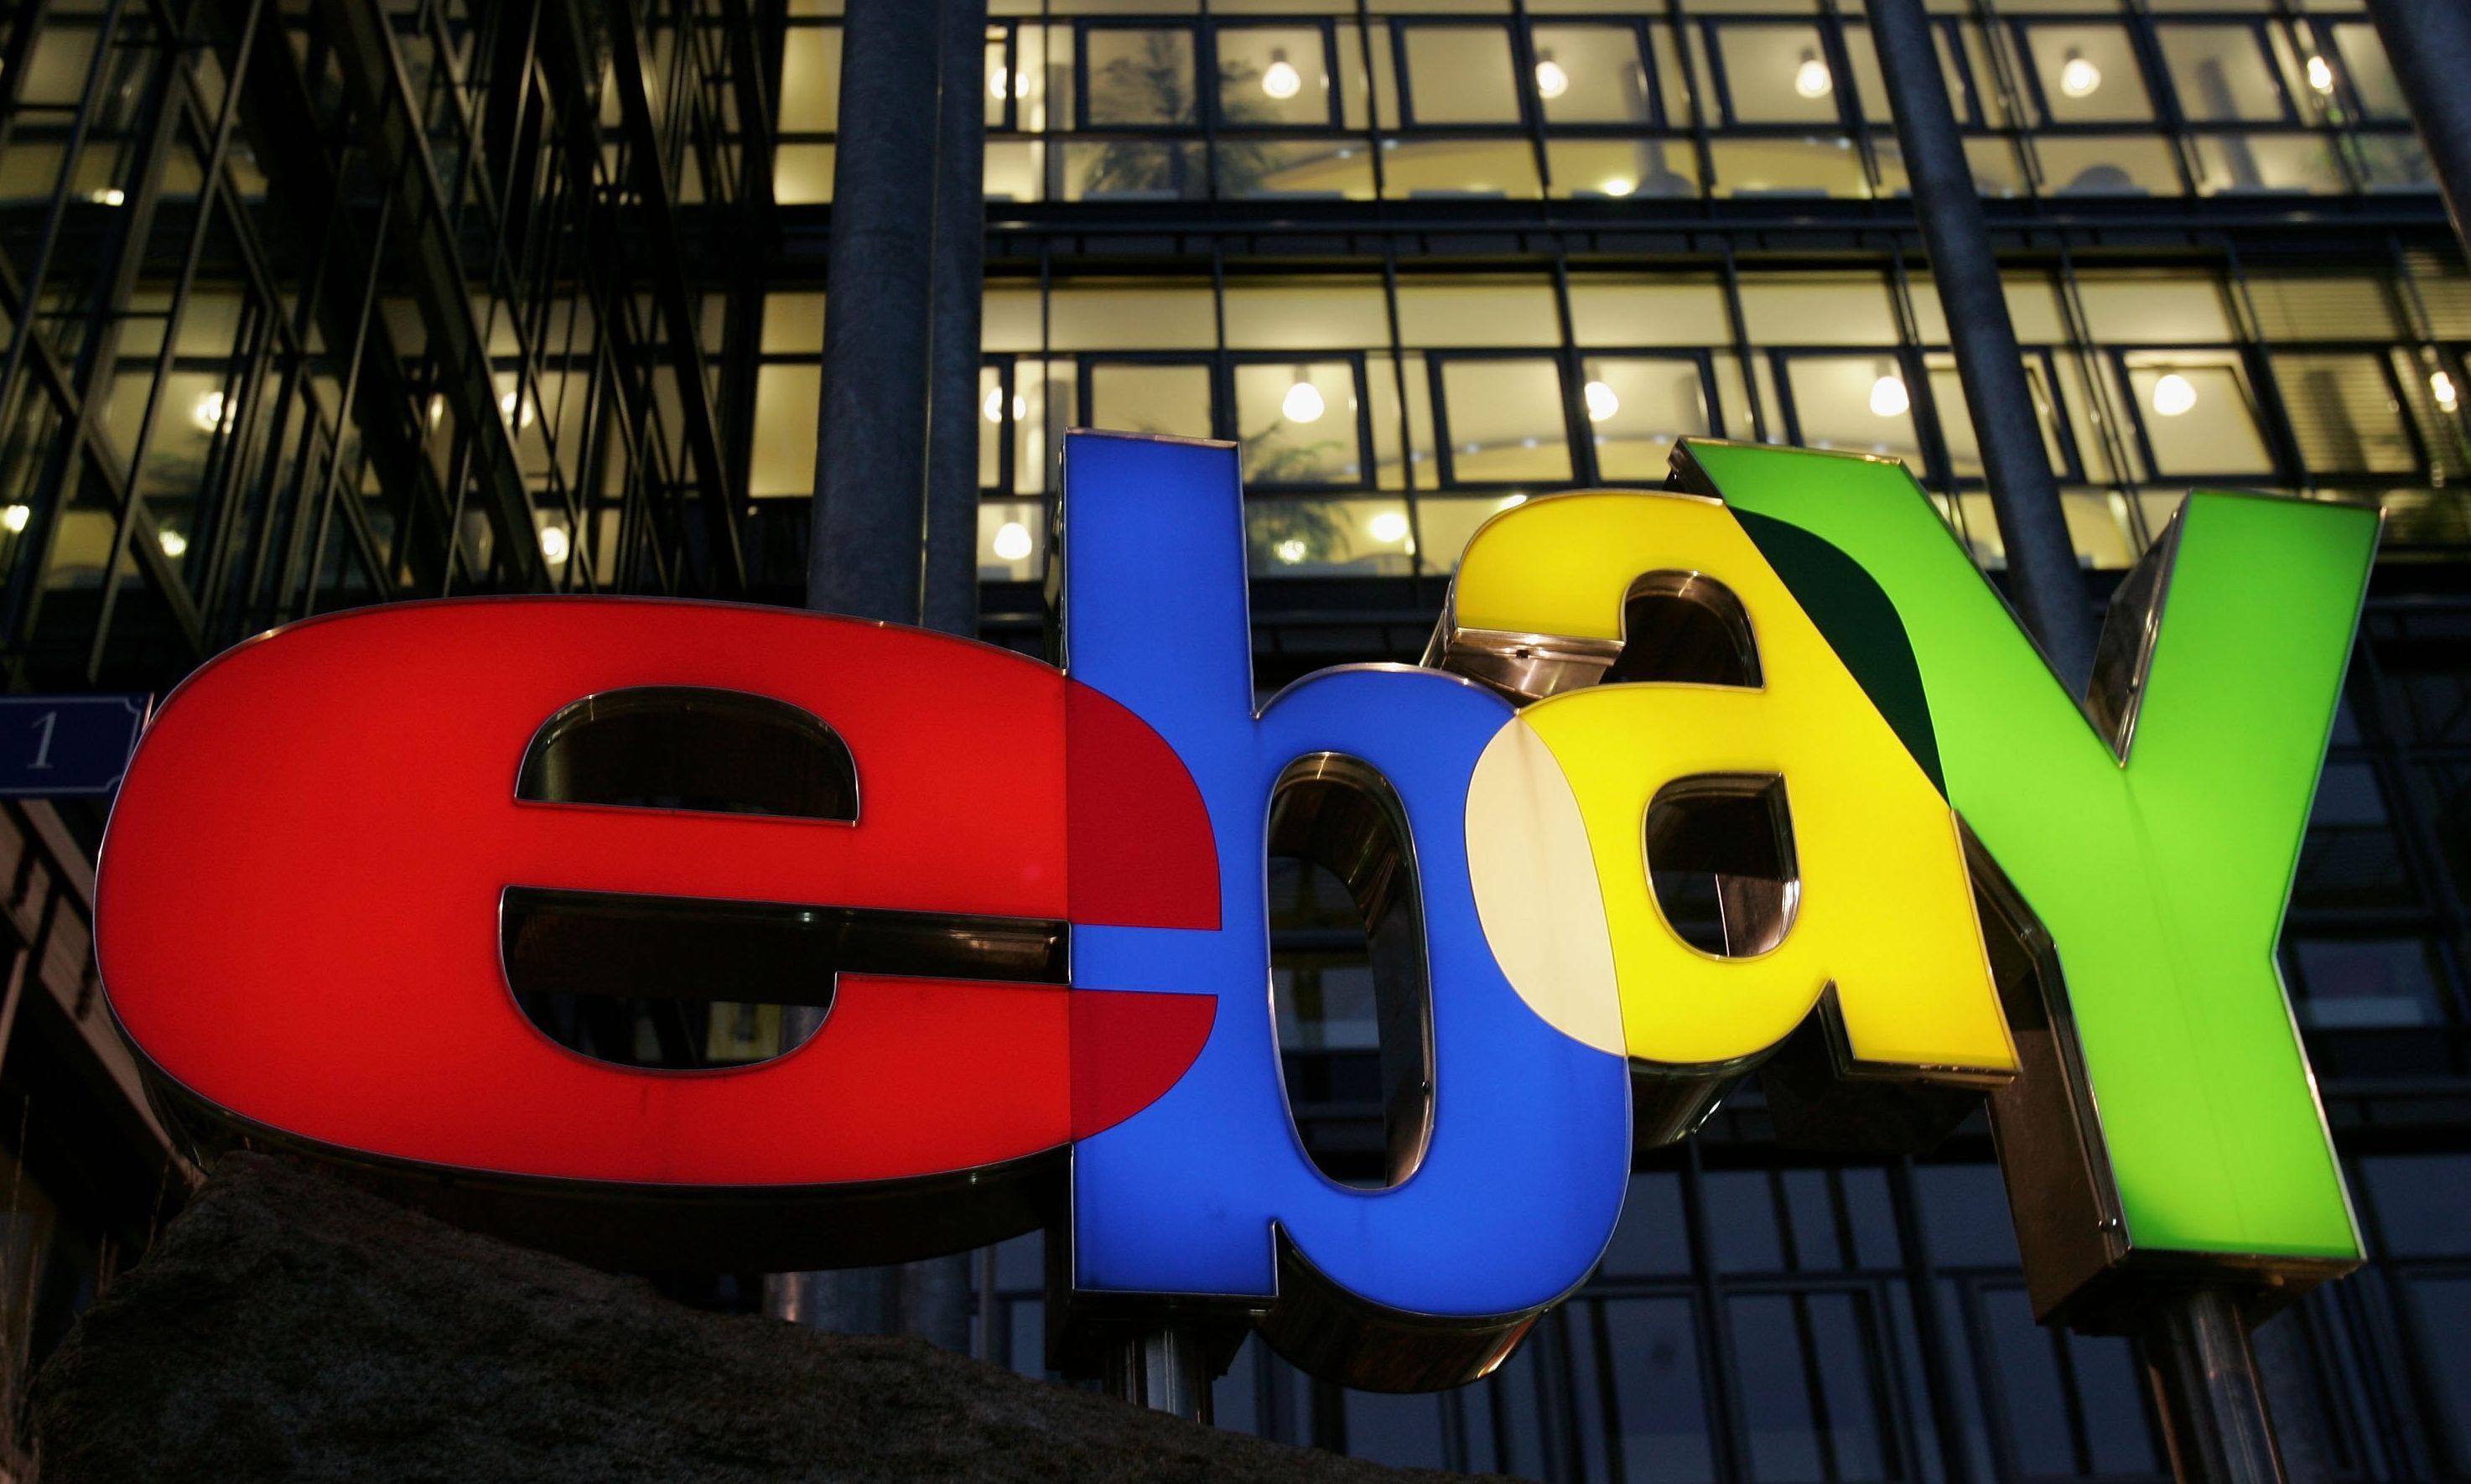 The logo of Internet auction house eBay.